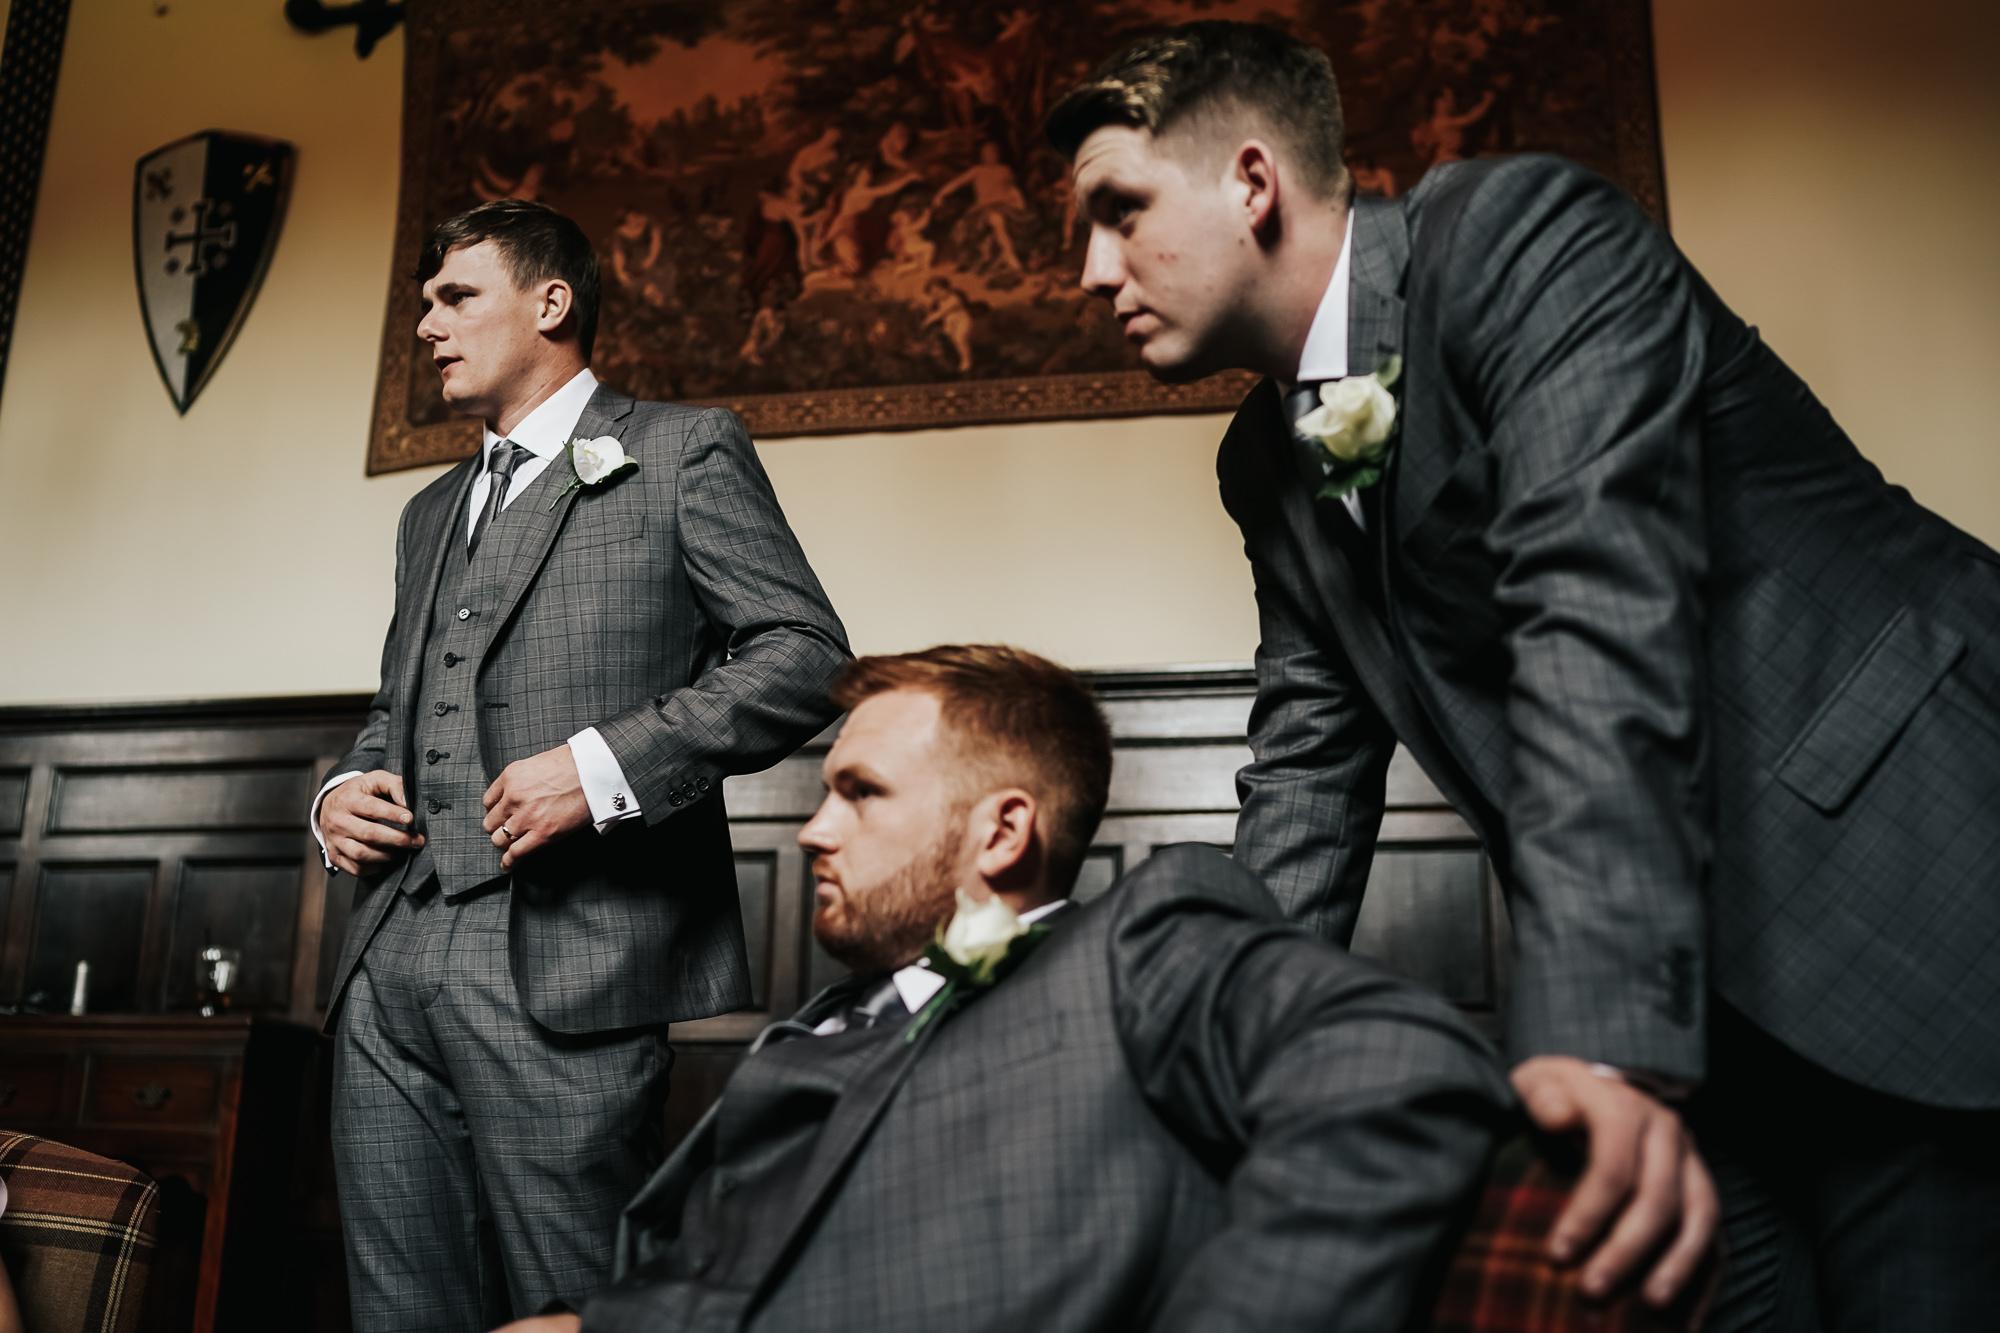 Peckforton Castle wedding photography cheshire wedding photographer (37 of 57).jpg